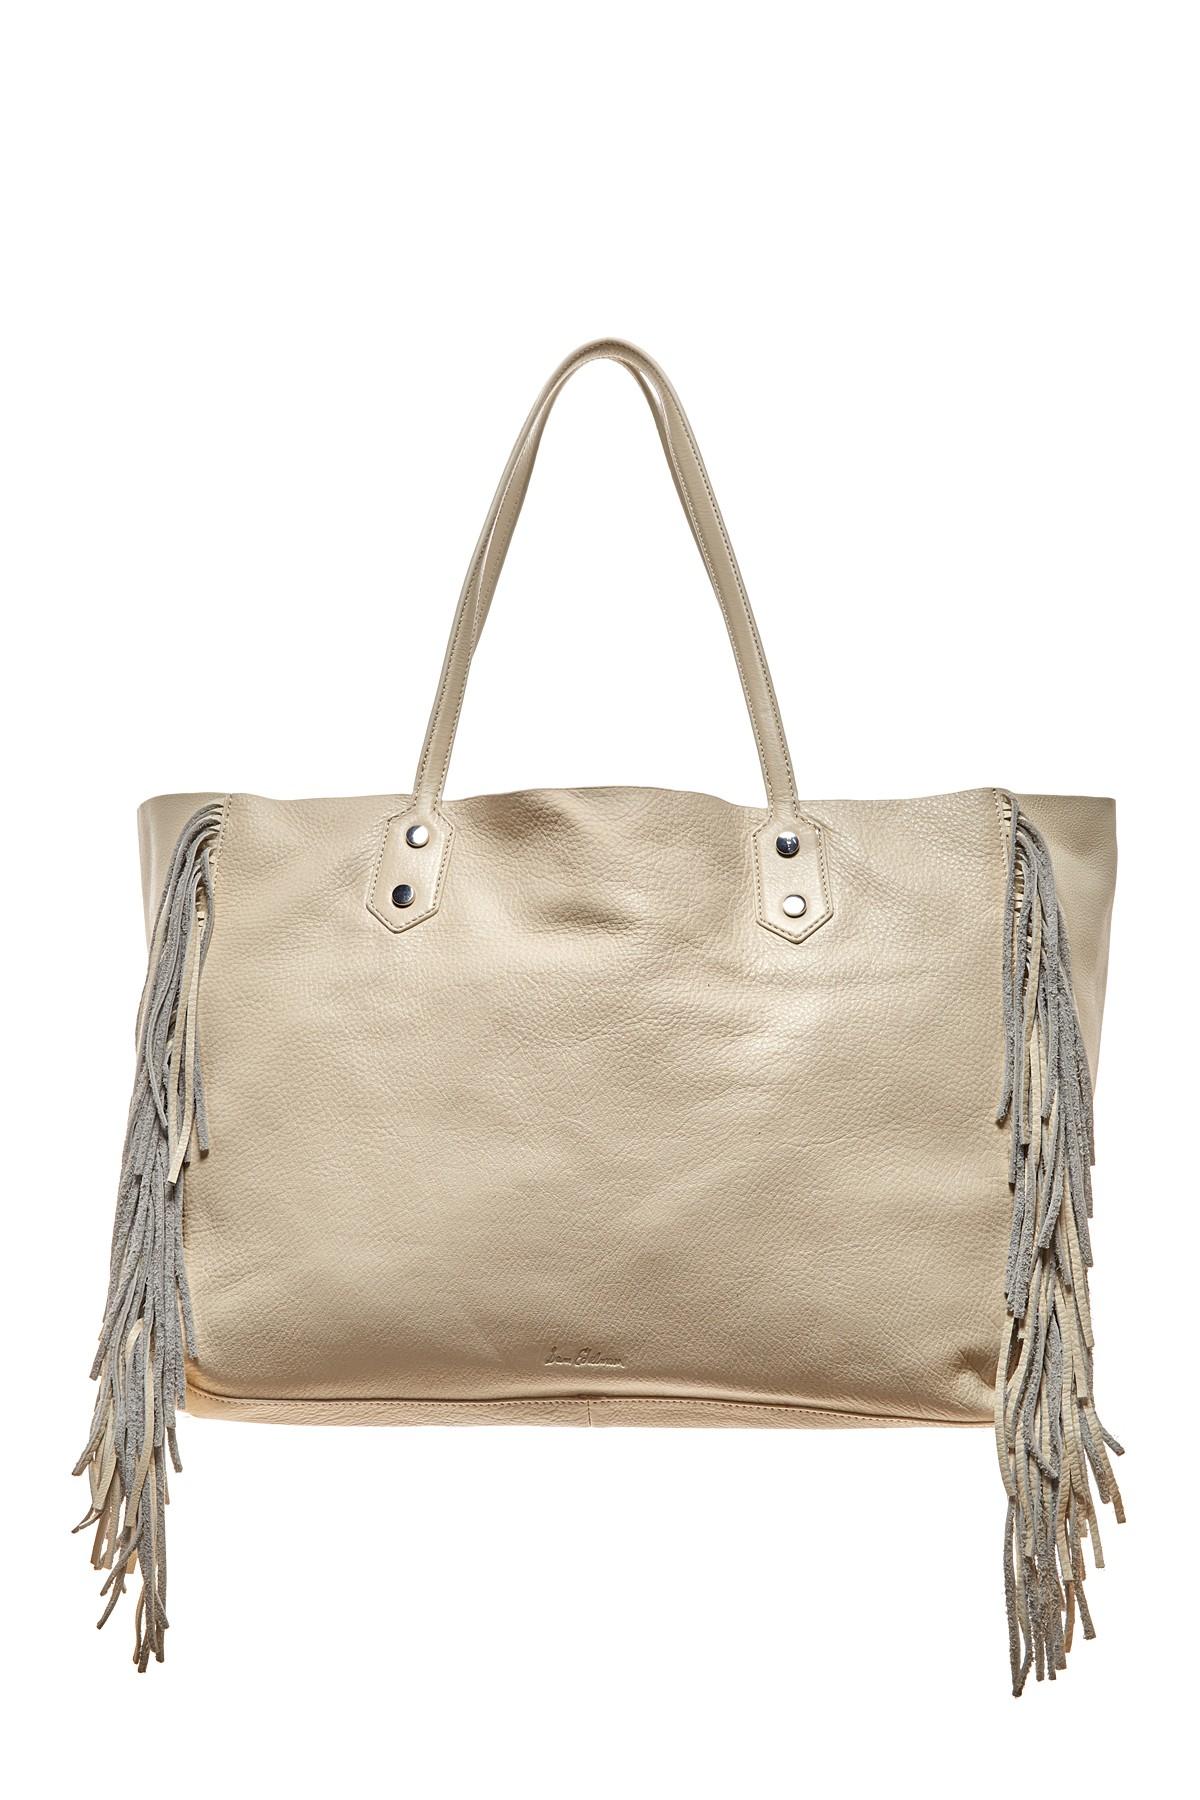 Sam Edelman Payton Leather Fringe Tote Bag In Natural Lyst